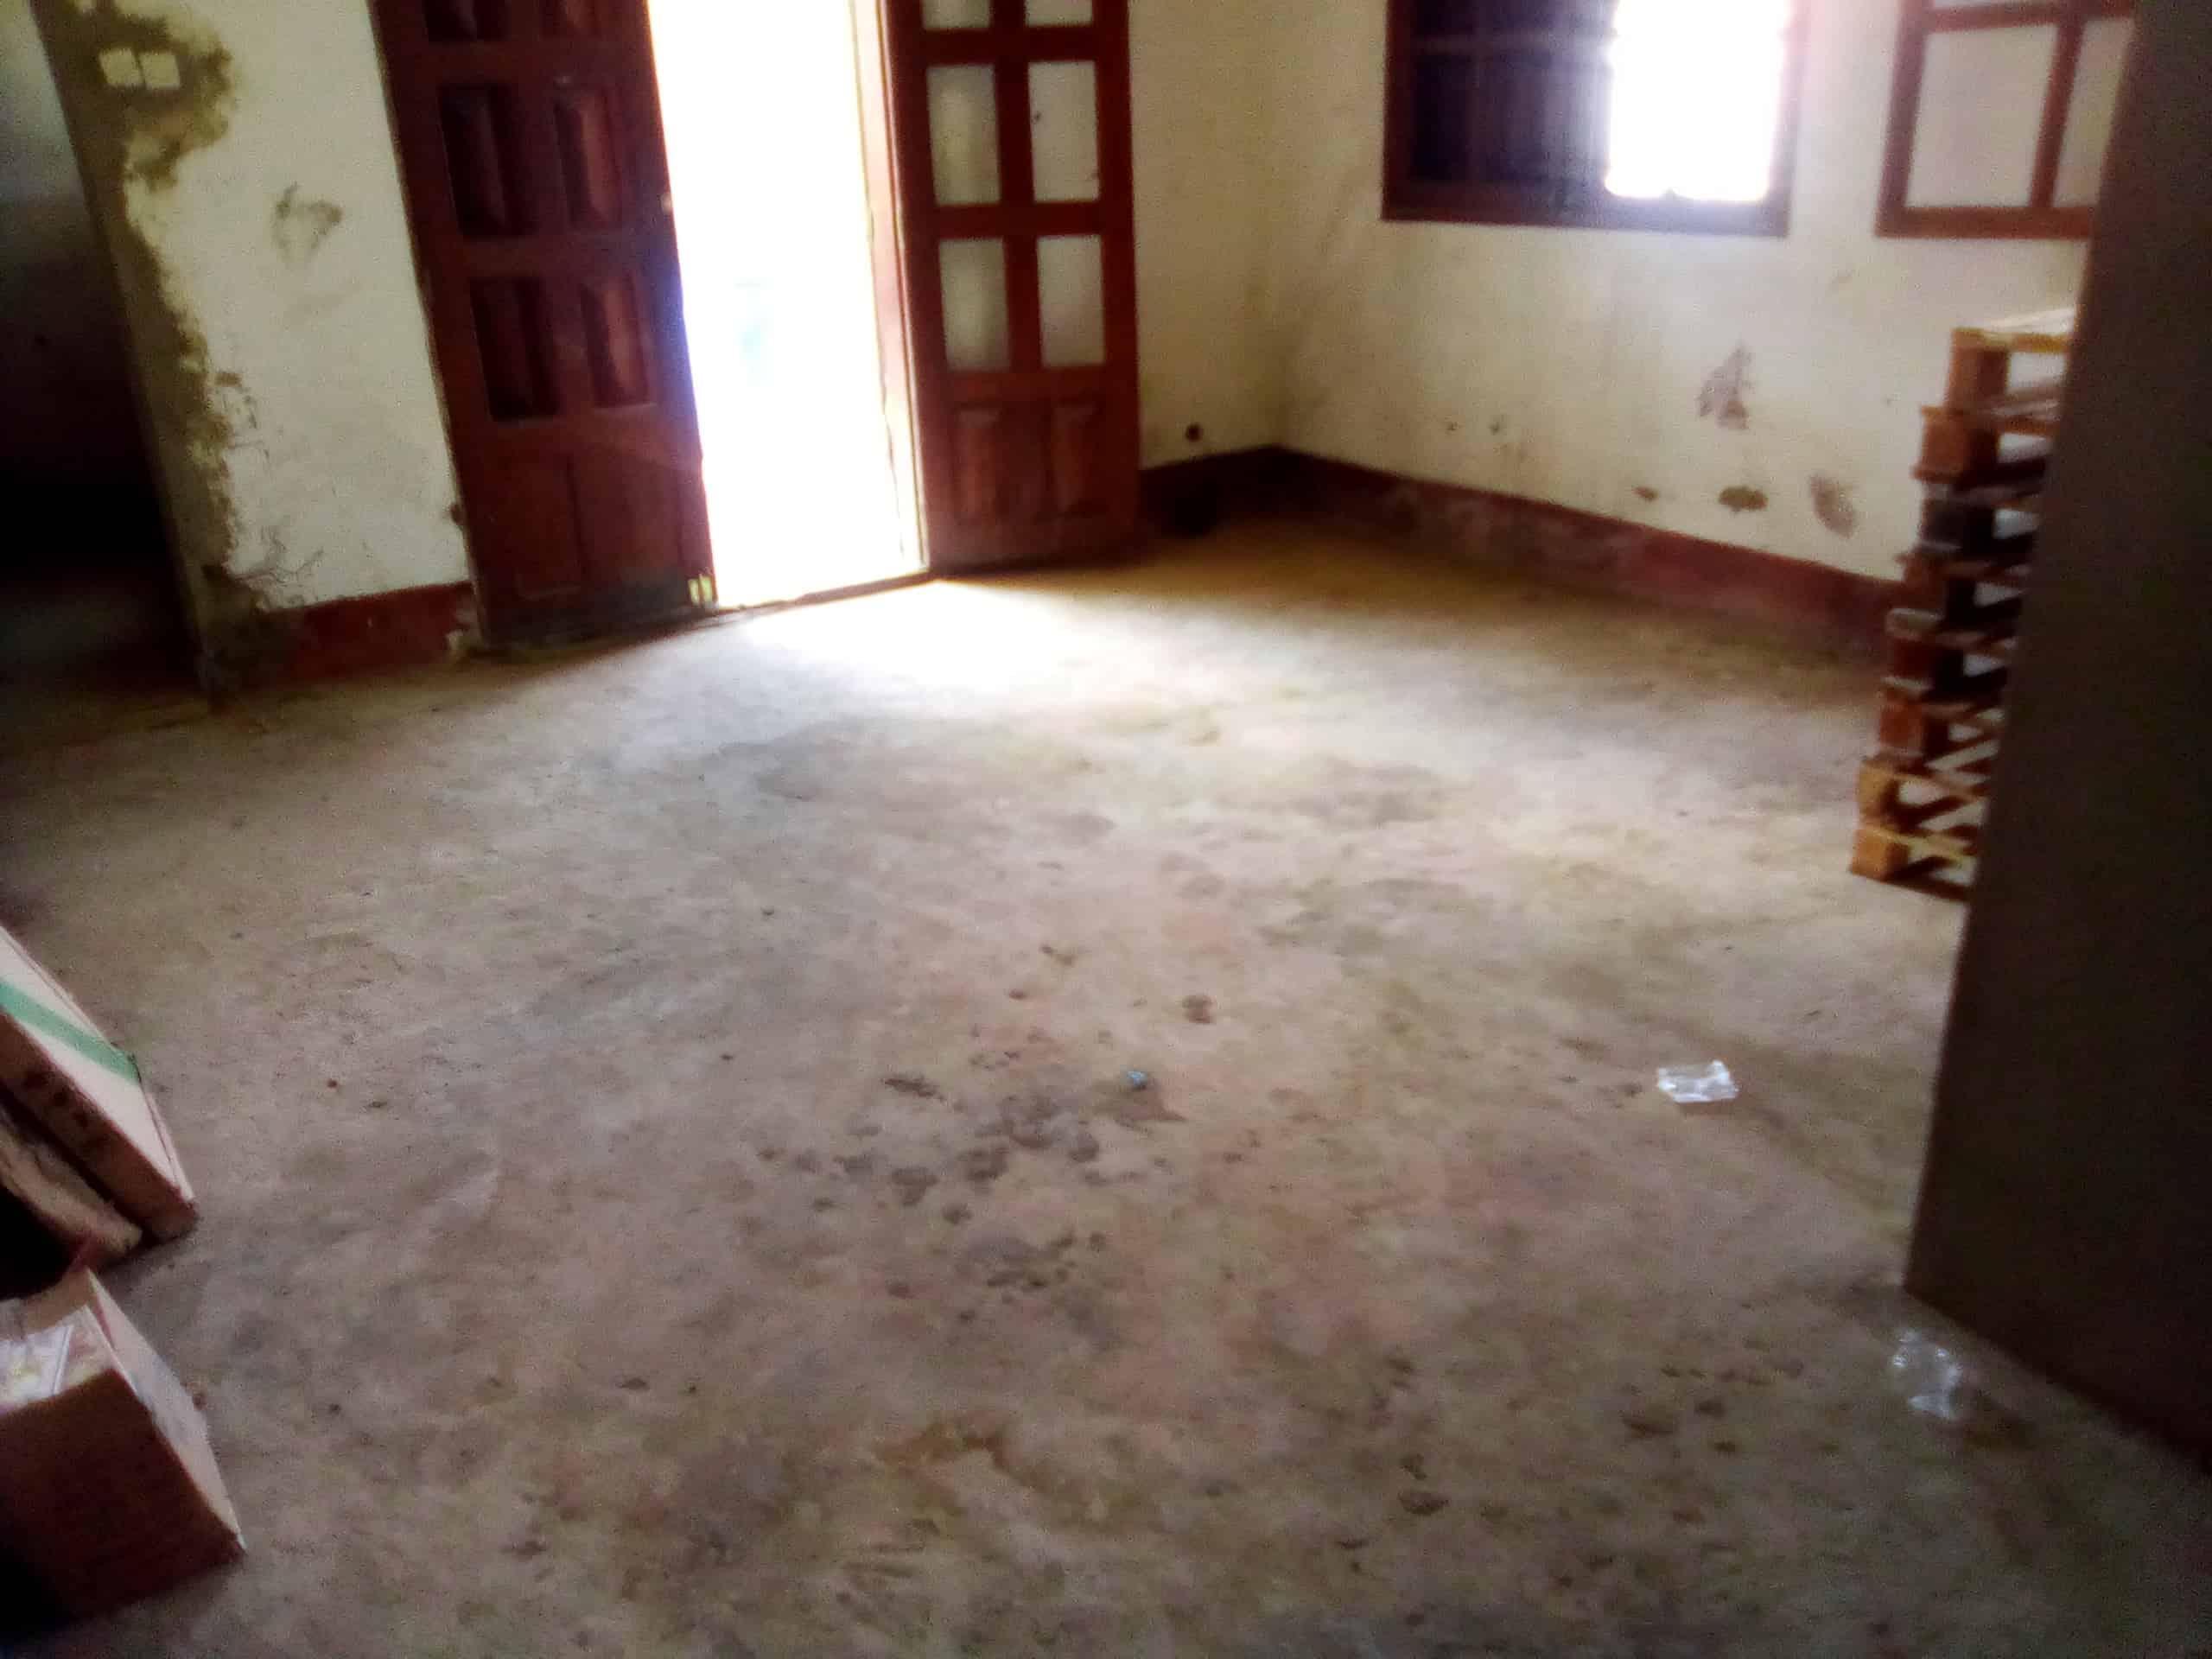 Apartment to rent - Douala, Kotto, bloc - 1 living room(s), 1 bedroom(s), 1 bathroom(s) - 50 000 FCFA / month